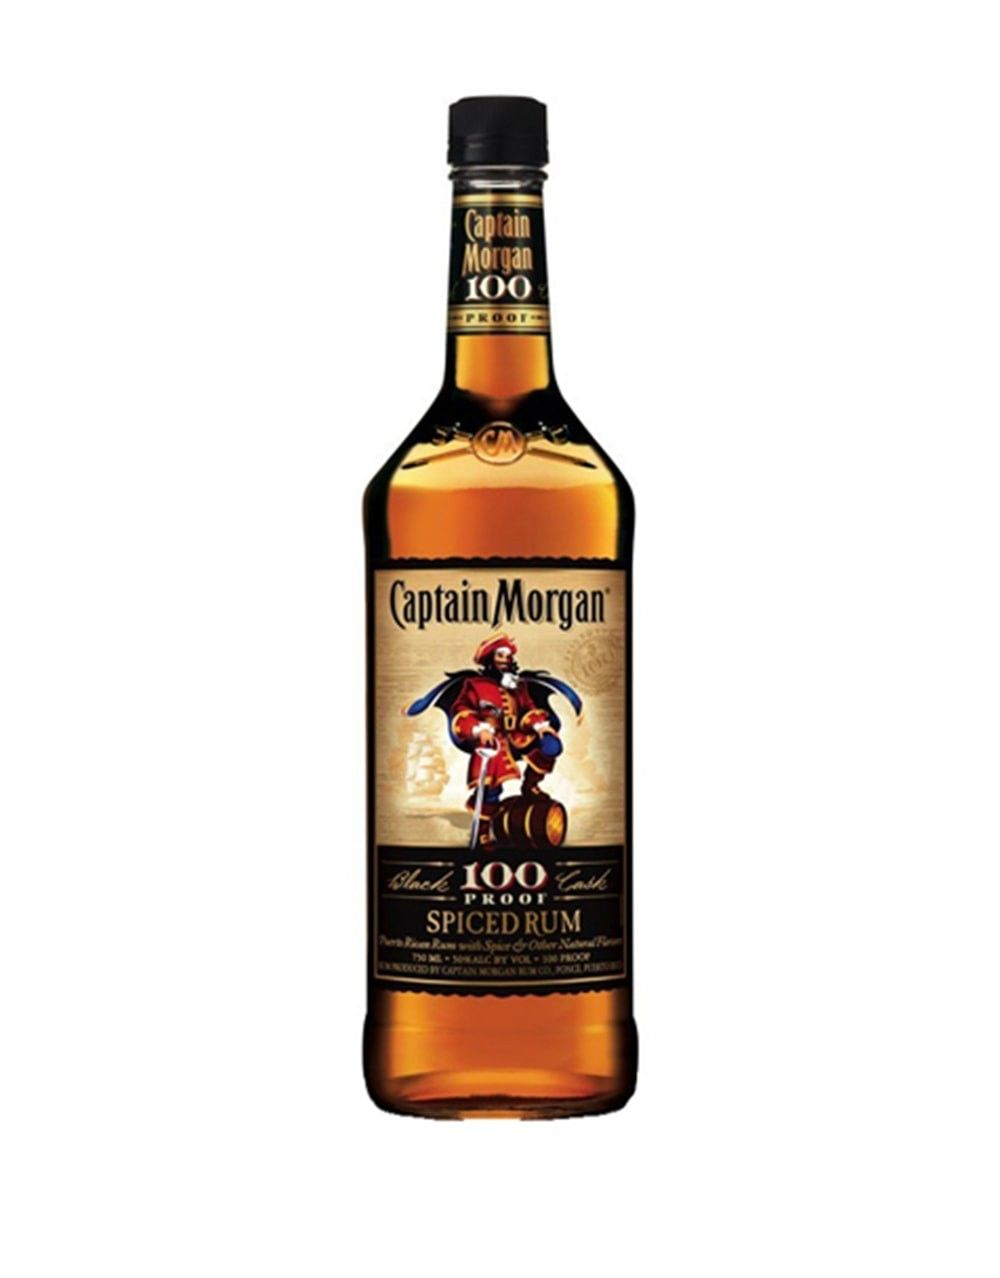 Captain Morgan Black Cask 100 Proof Spiced Rum  Buy